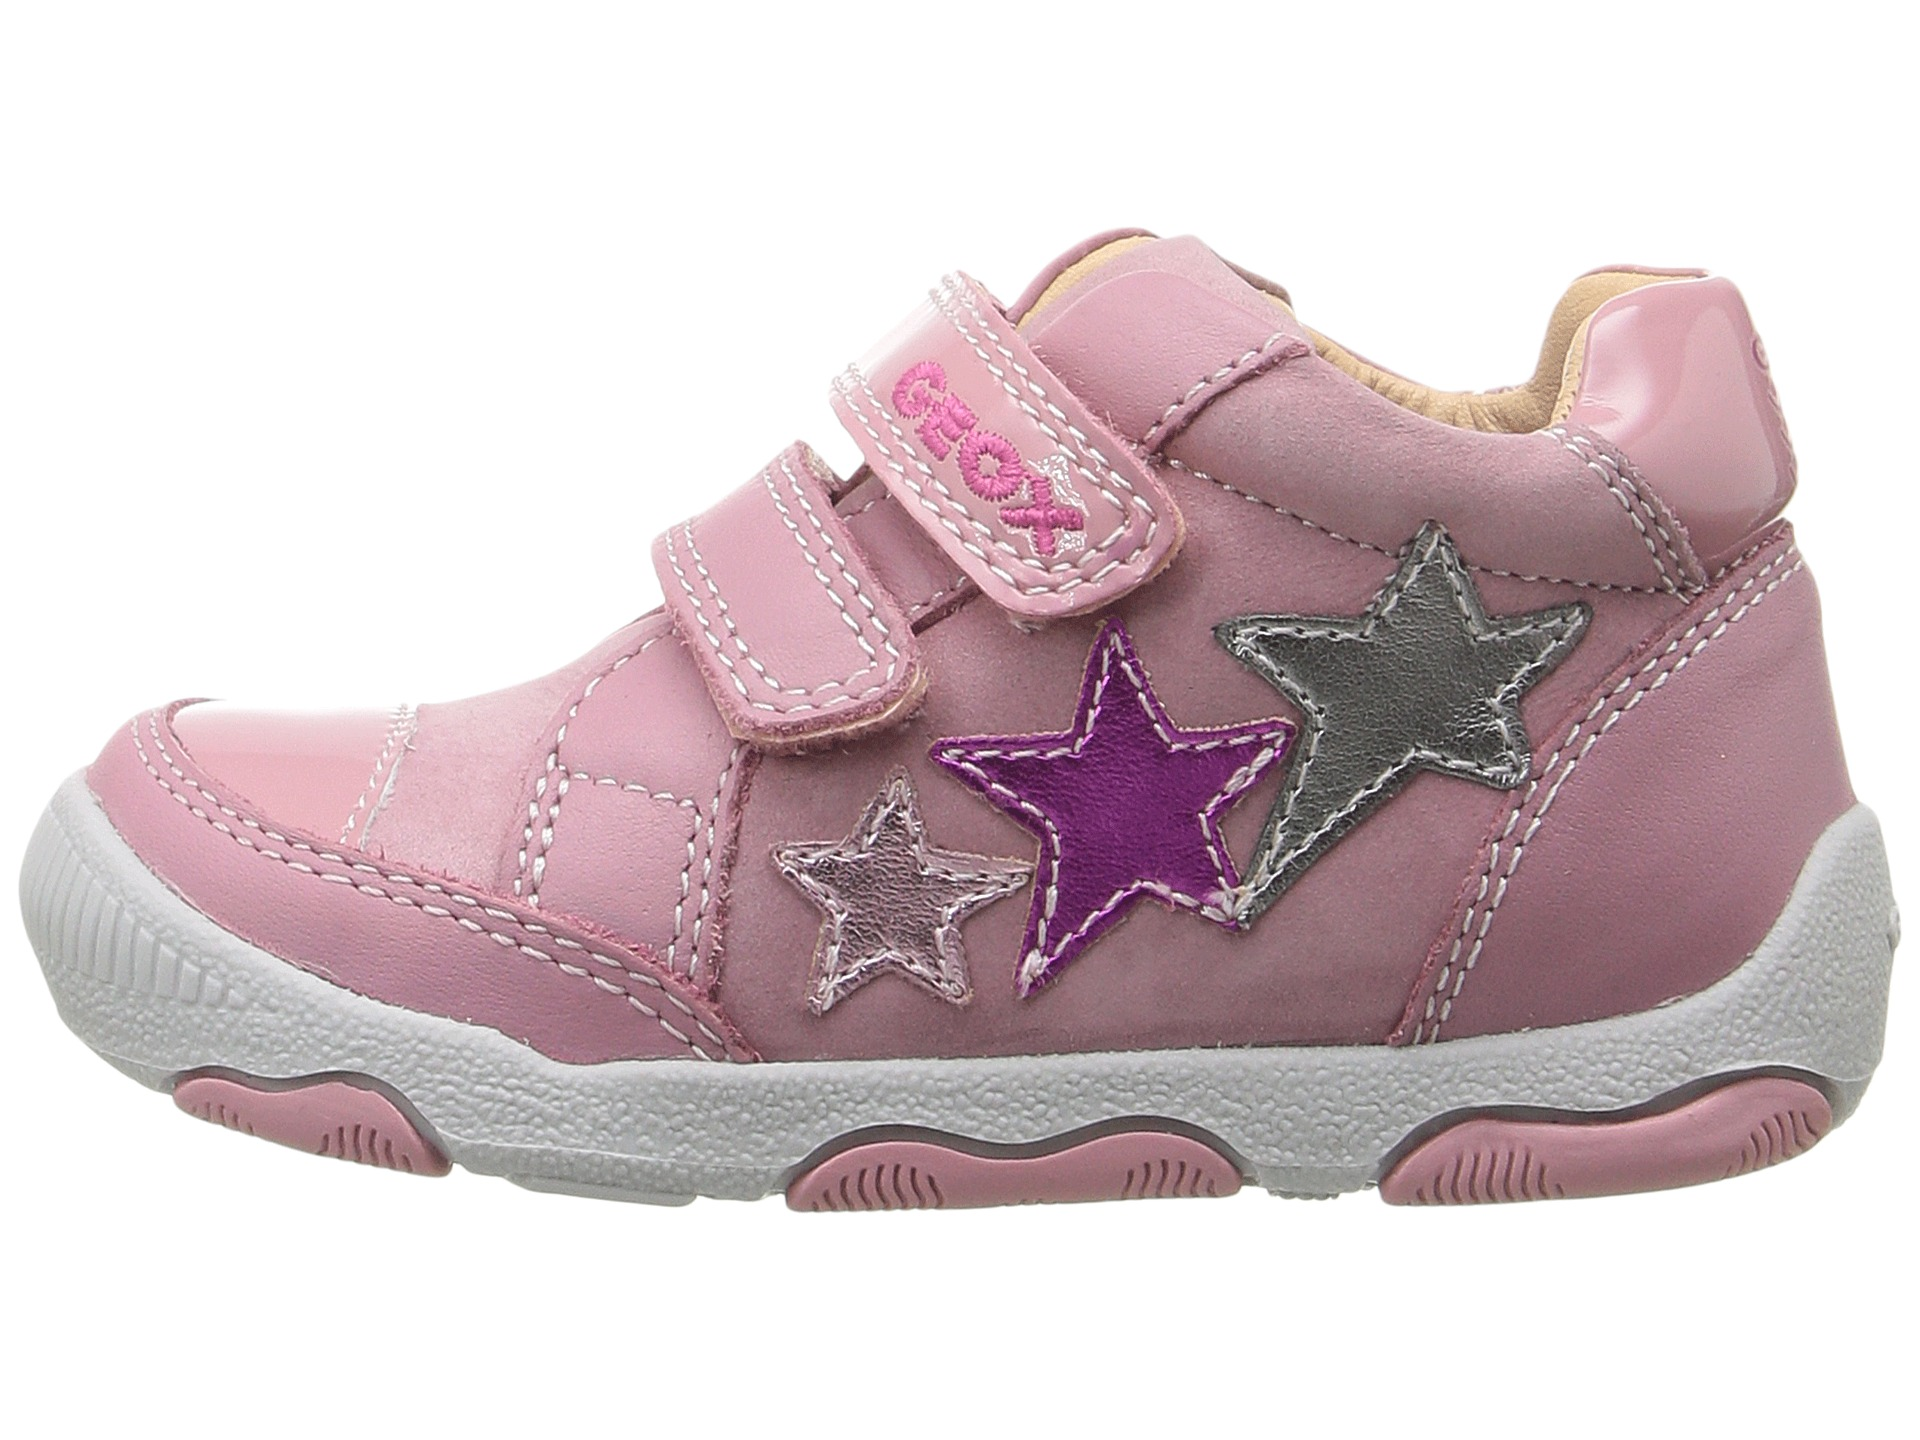 Geox Kids Baby New Balu Girl 3 Infant Toddler Zappos